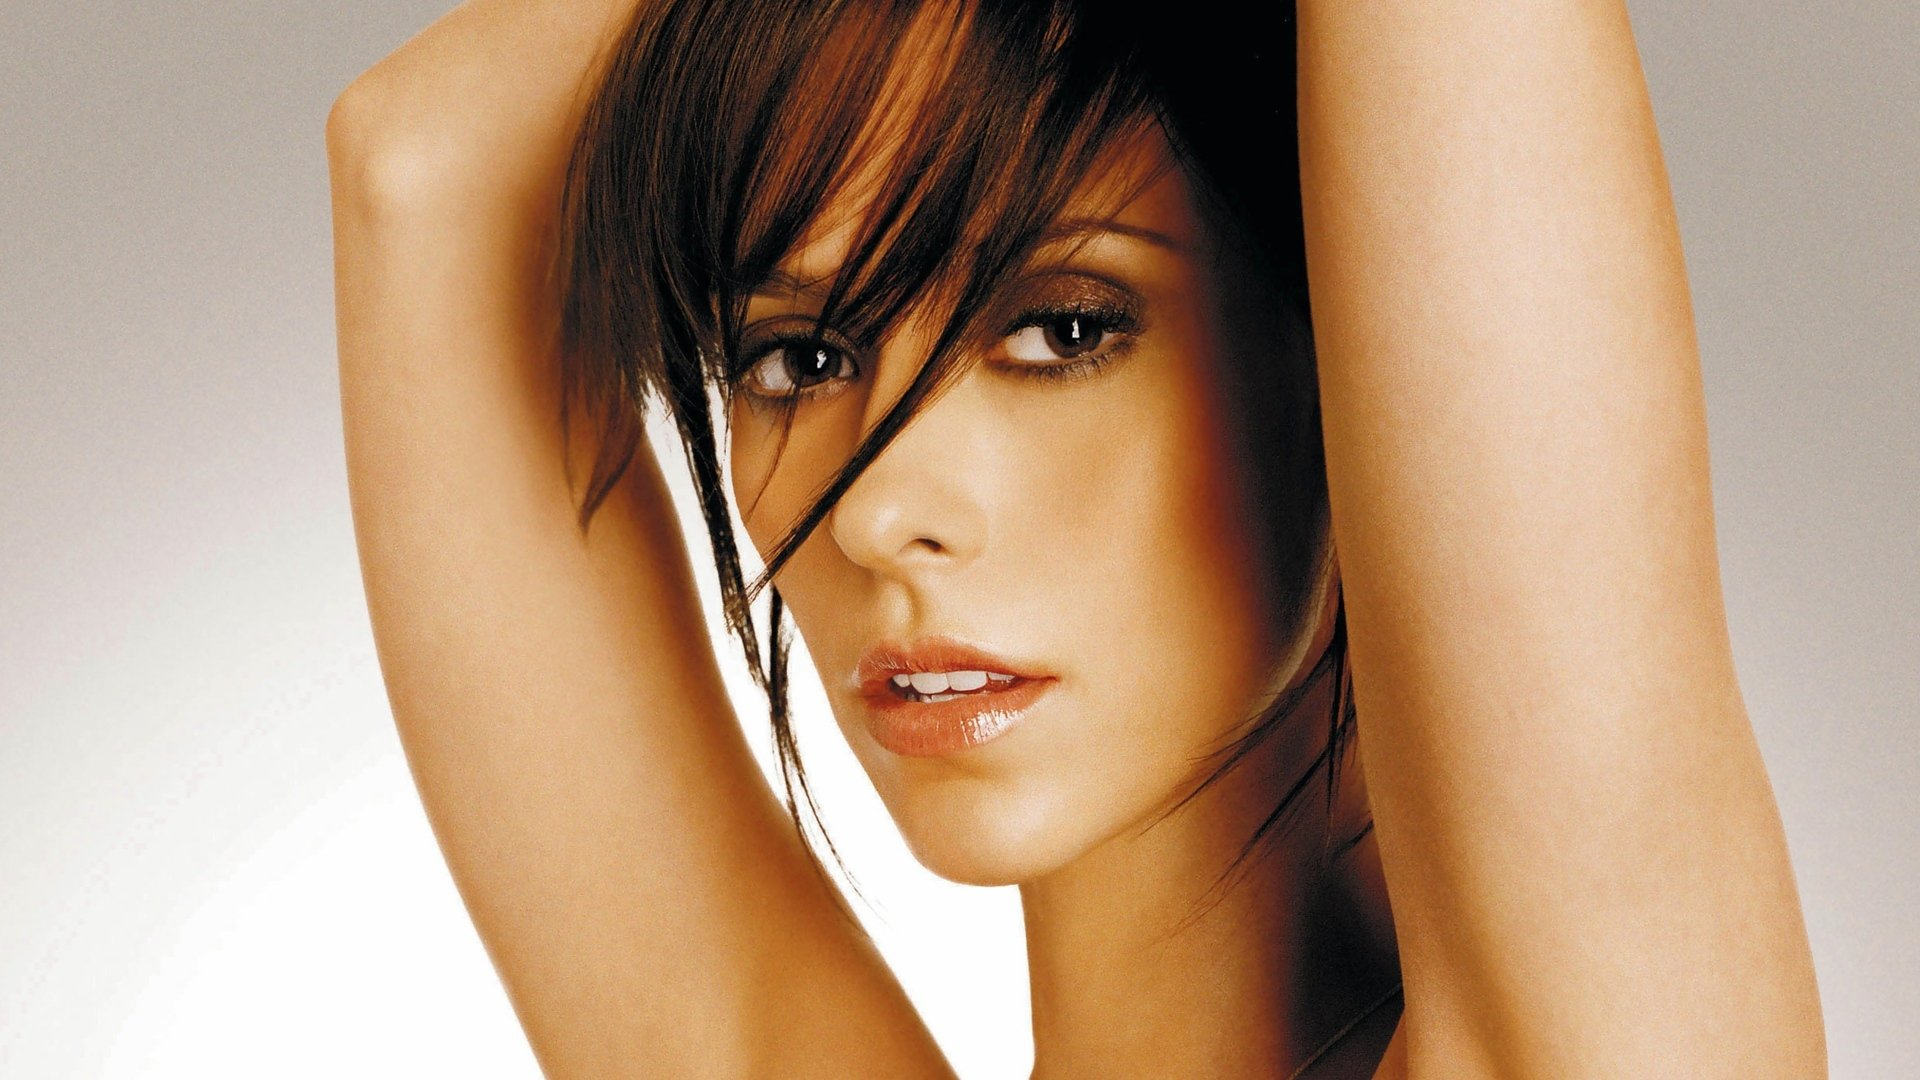 89 Jennifer Love Hewitt Hd Wallpapers Background Images